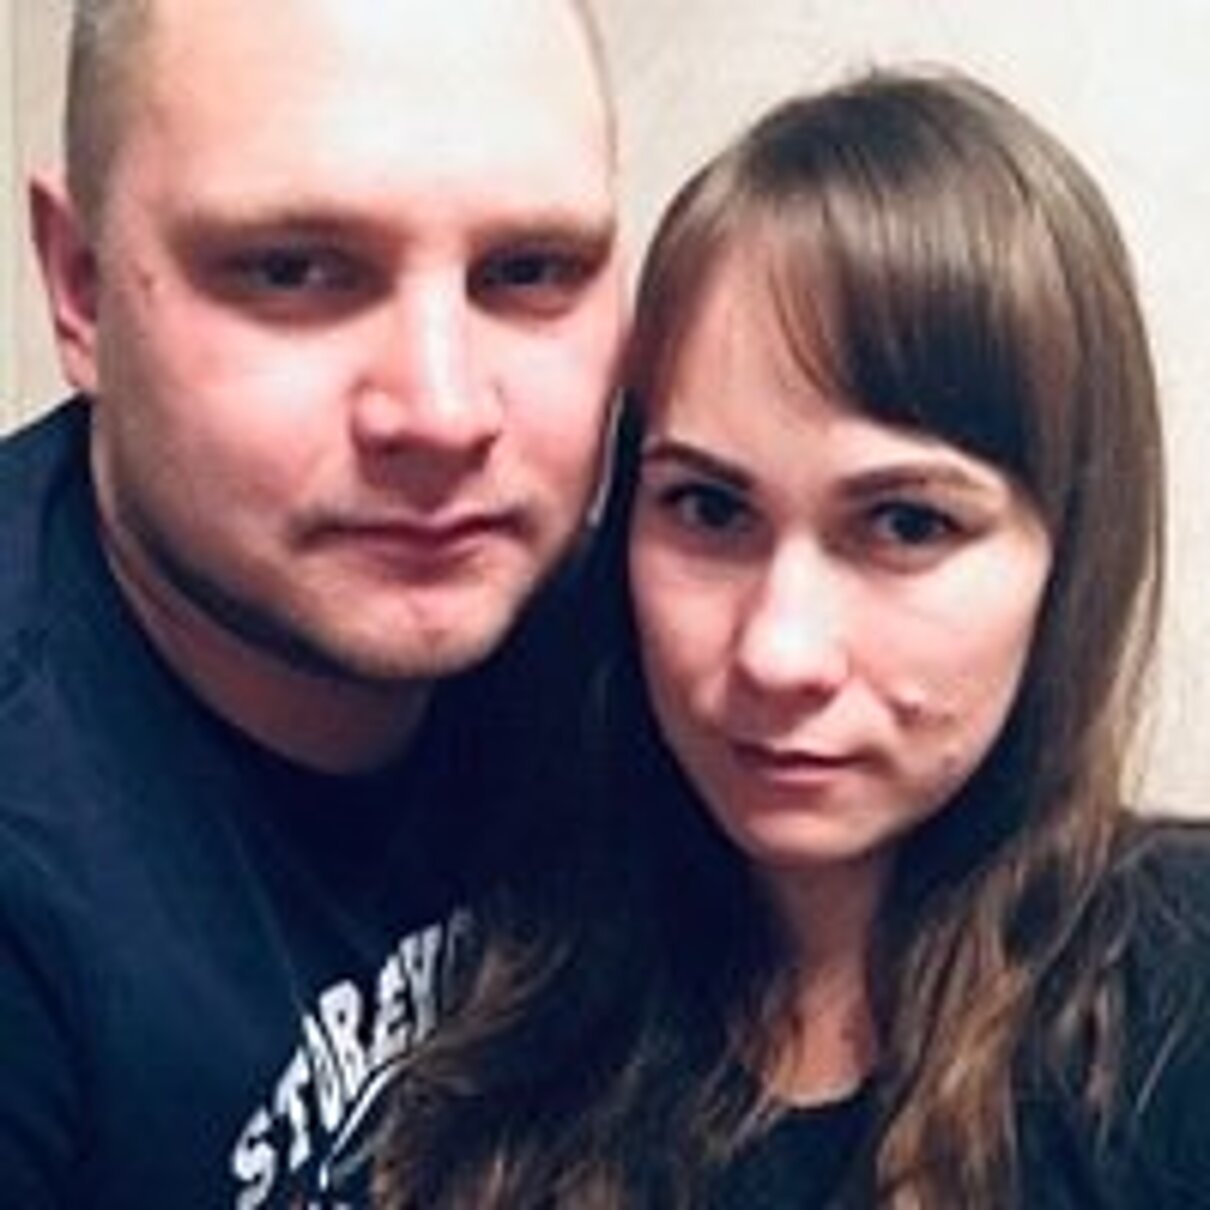 Жалоба-отзыв: Шулепов Дмитрий мошенник -арендатор - Арендаторы-мошенники.  Фото №1